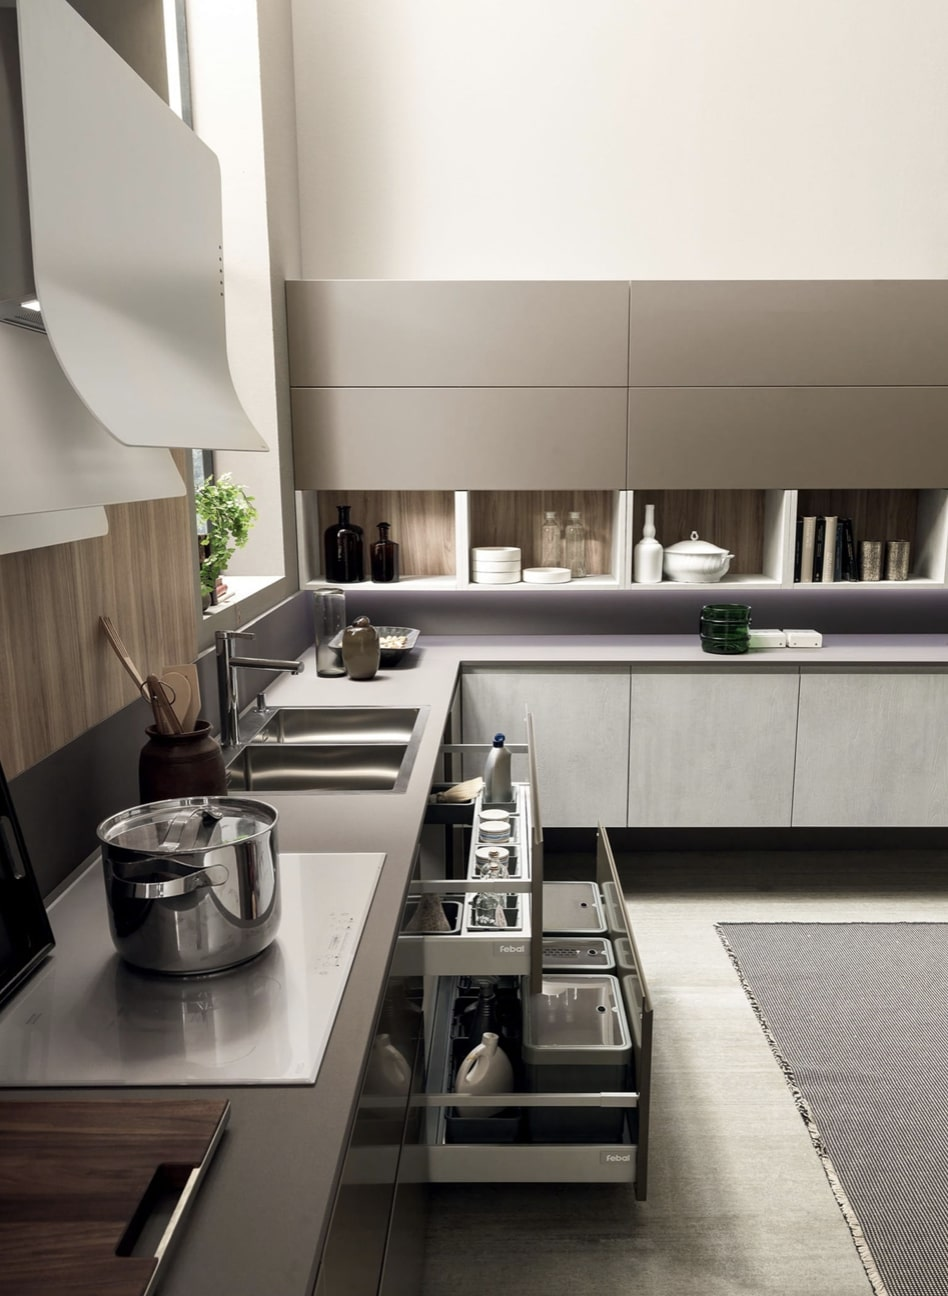 Cucina moderna Febal - modello Volumia